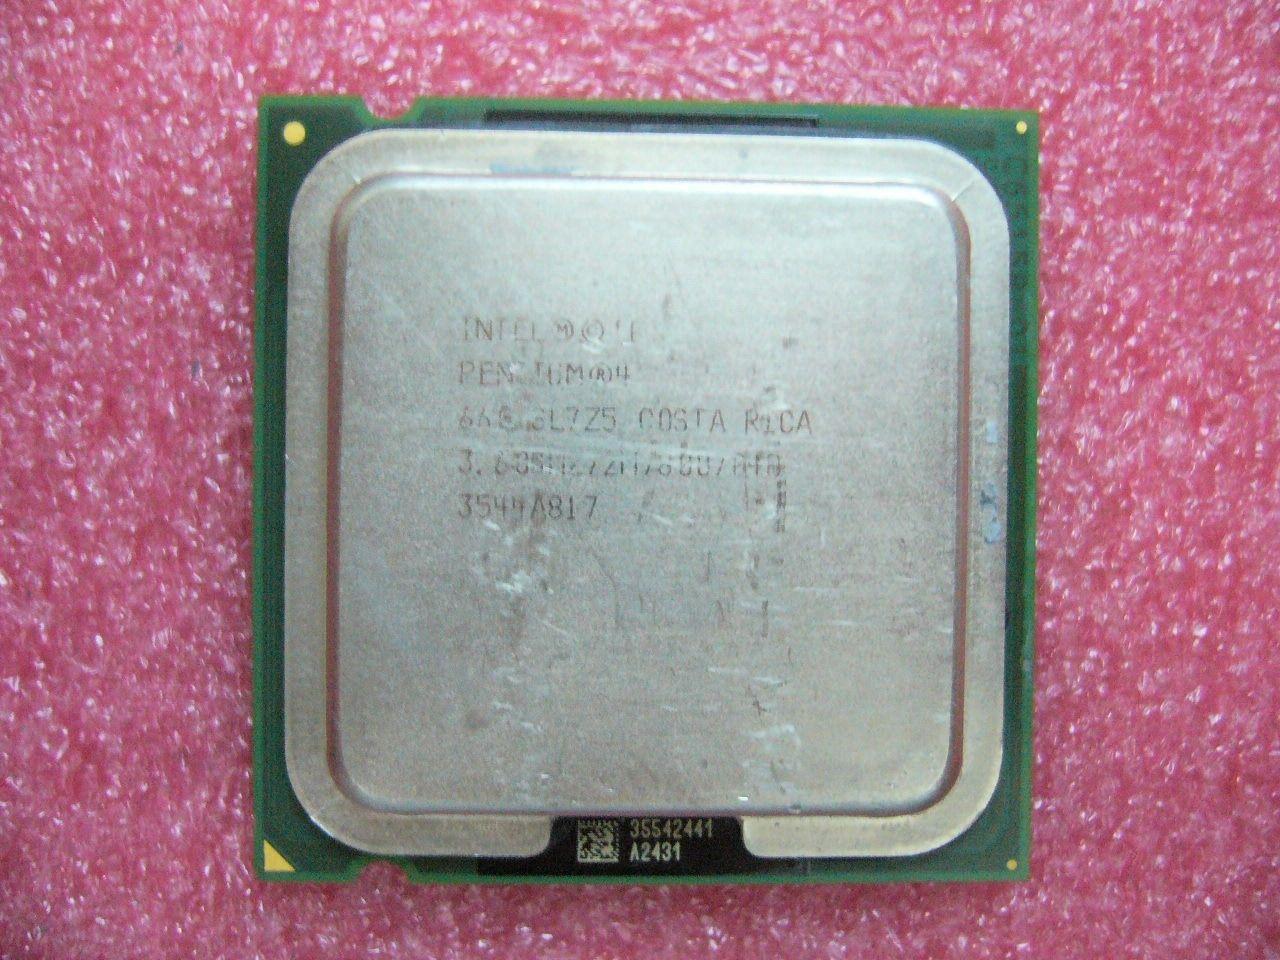 INTEL Pentium 4 CPU 660 3.60GHz 2MB/800Mhz LGA775 SL7Z5 SL8PZ